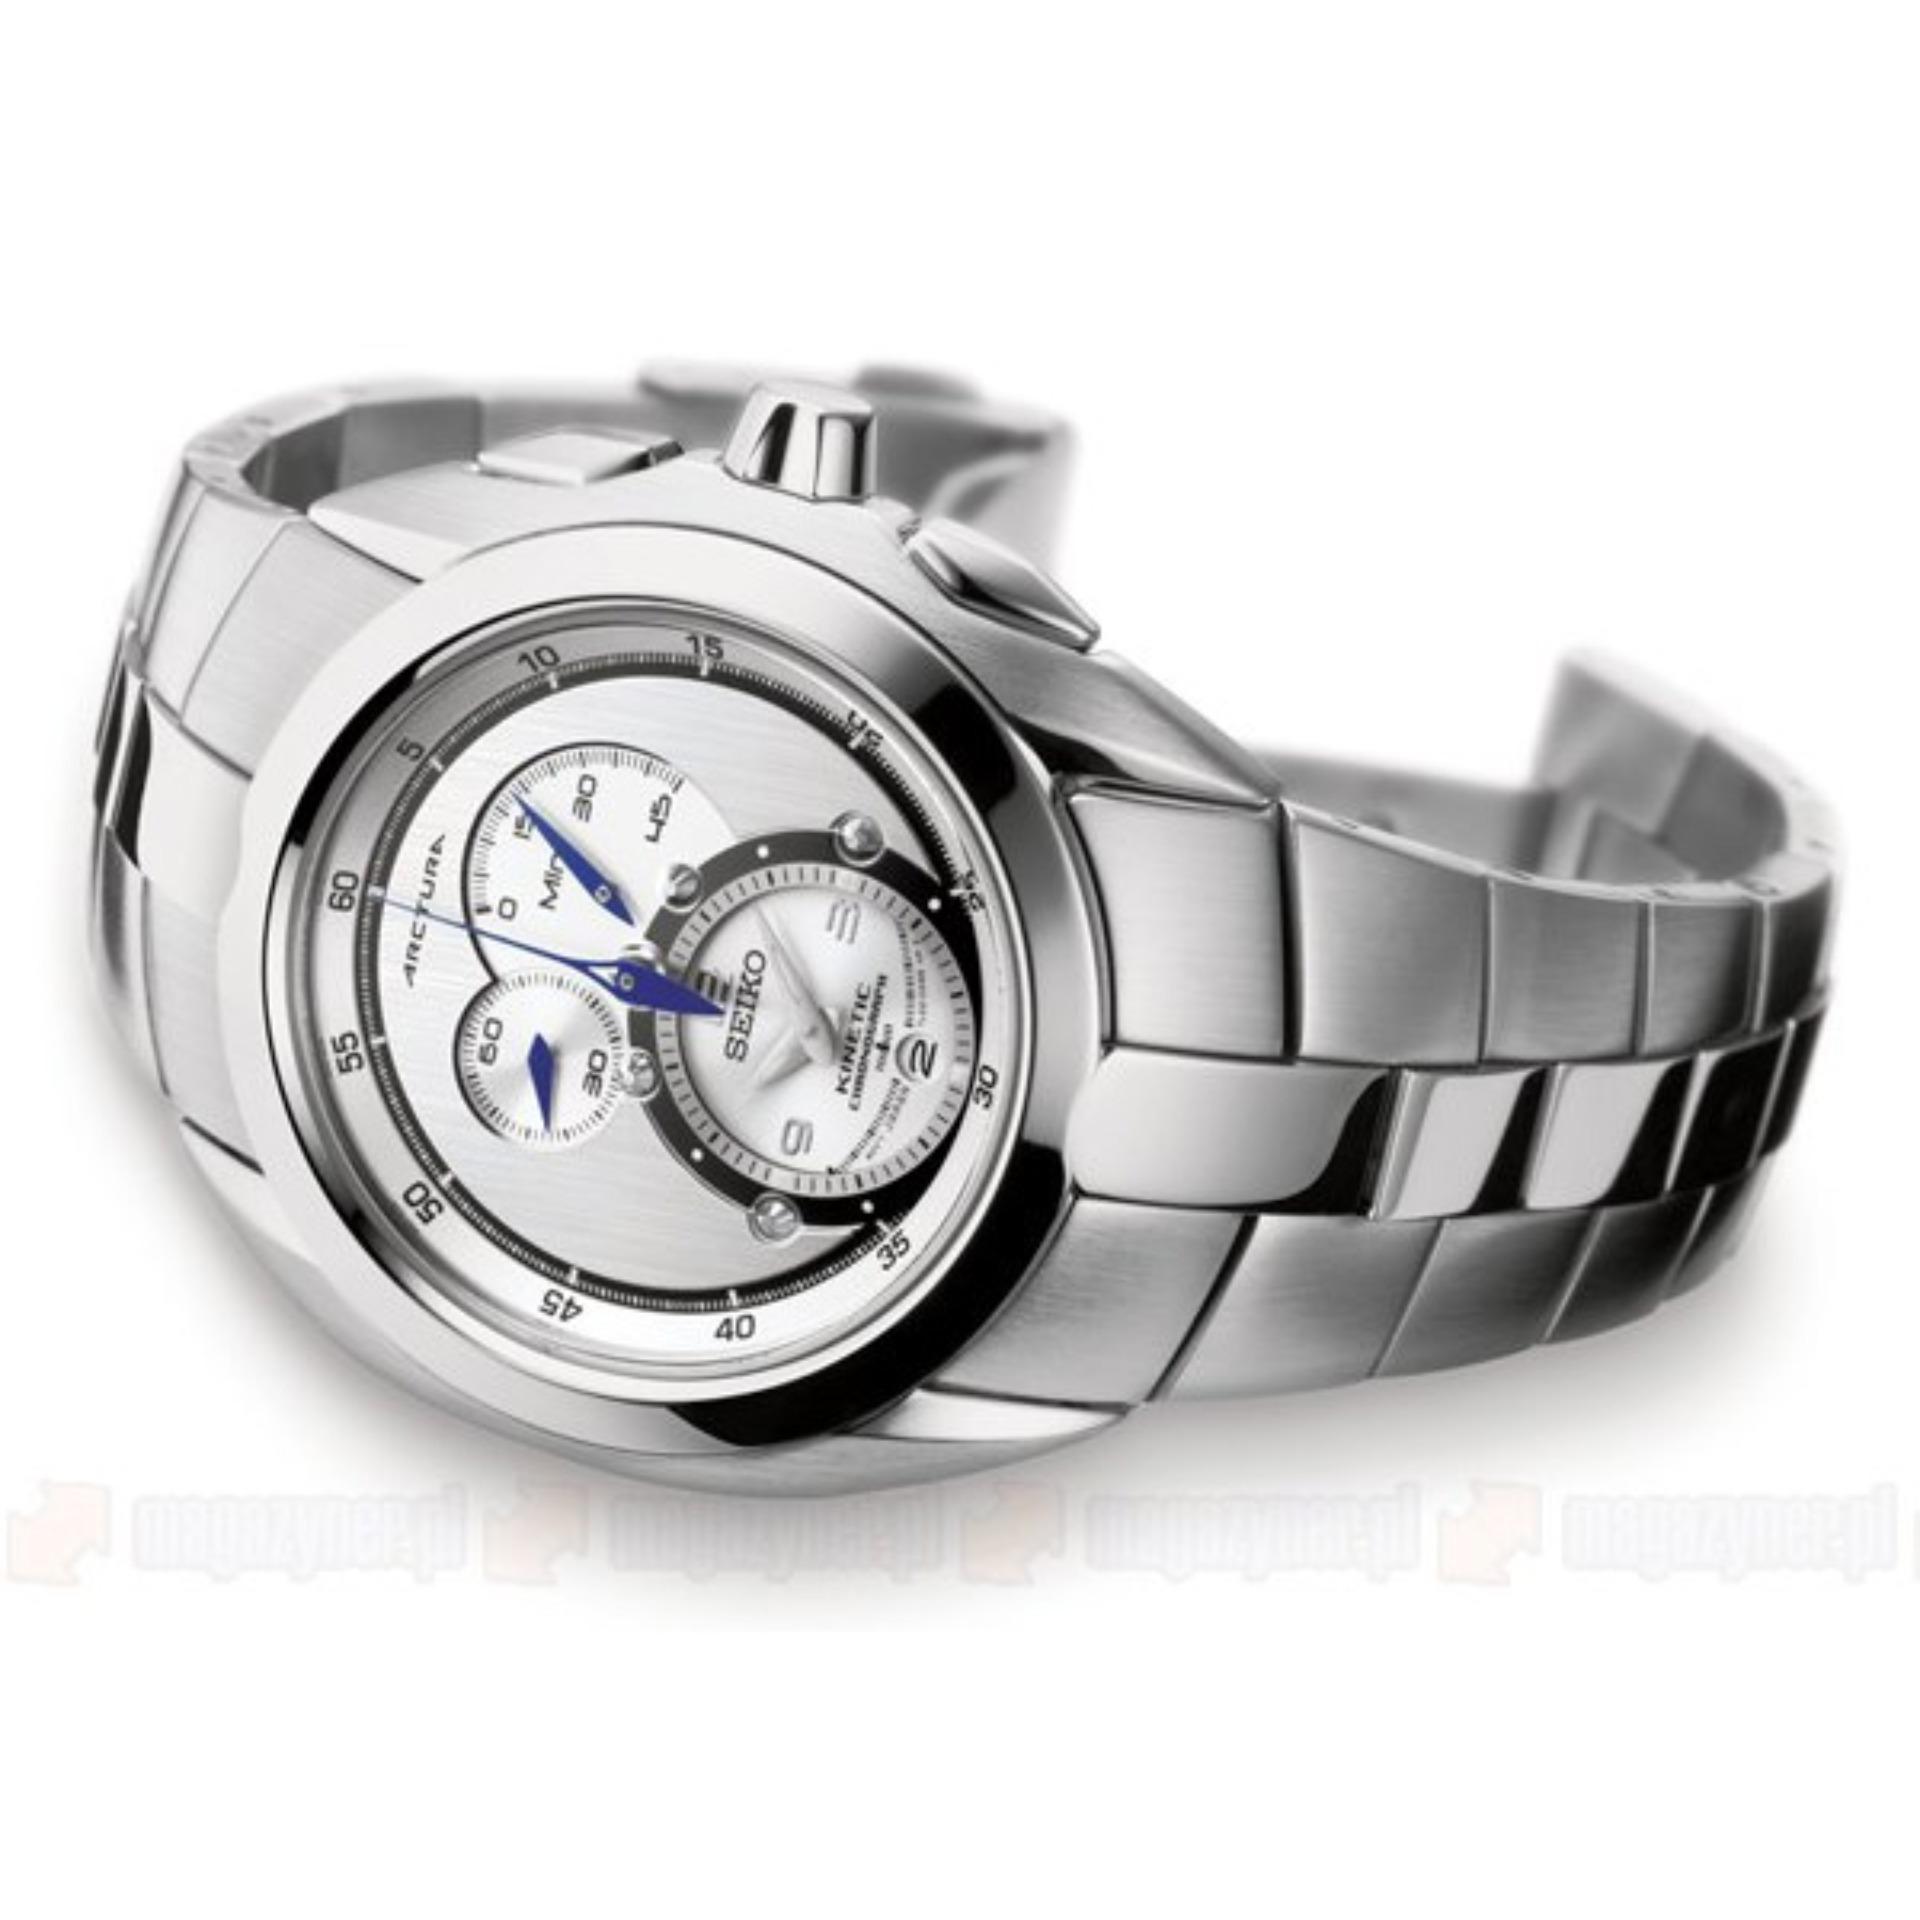 Pencarian Termurah Seiko Arctura Kinetic Chronograph Snl045p1 Jam Ska683p1 Silver Dial Stainless Steel Bracelet Tangan Pria Snl045